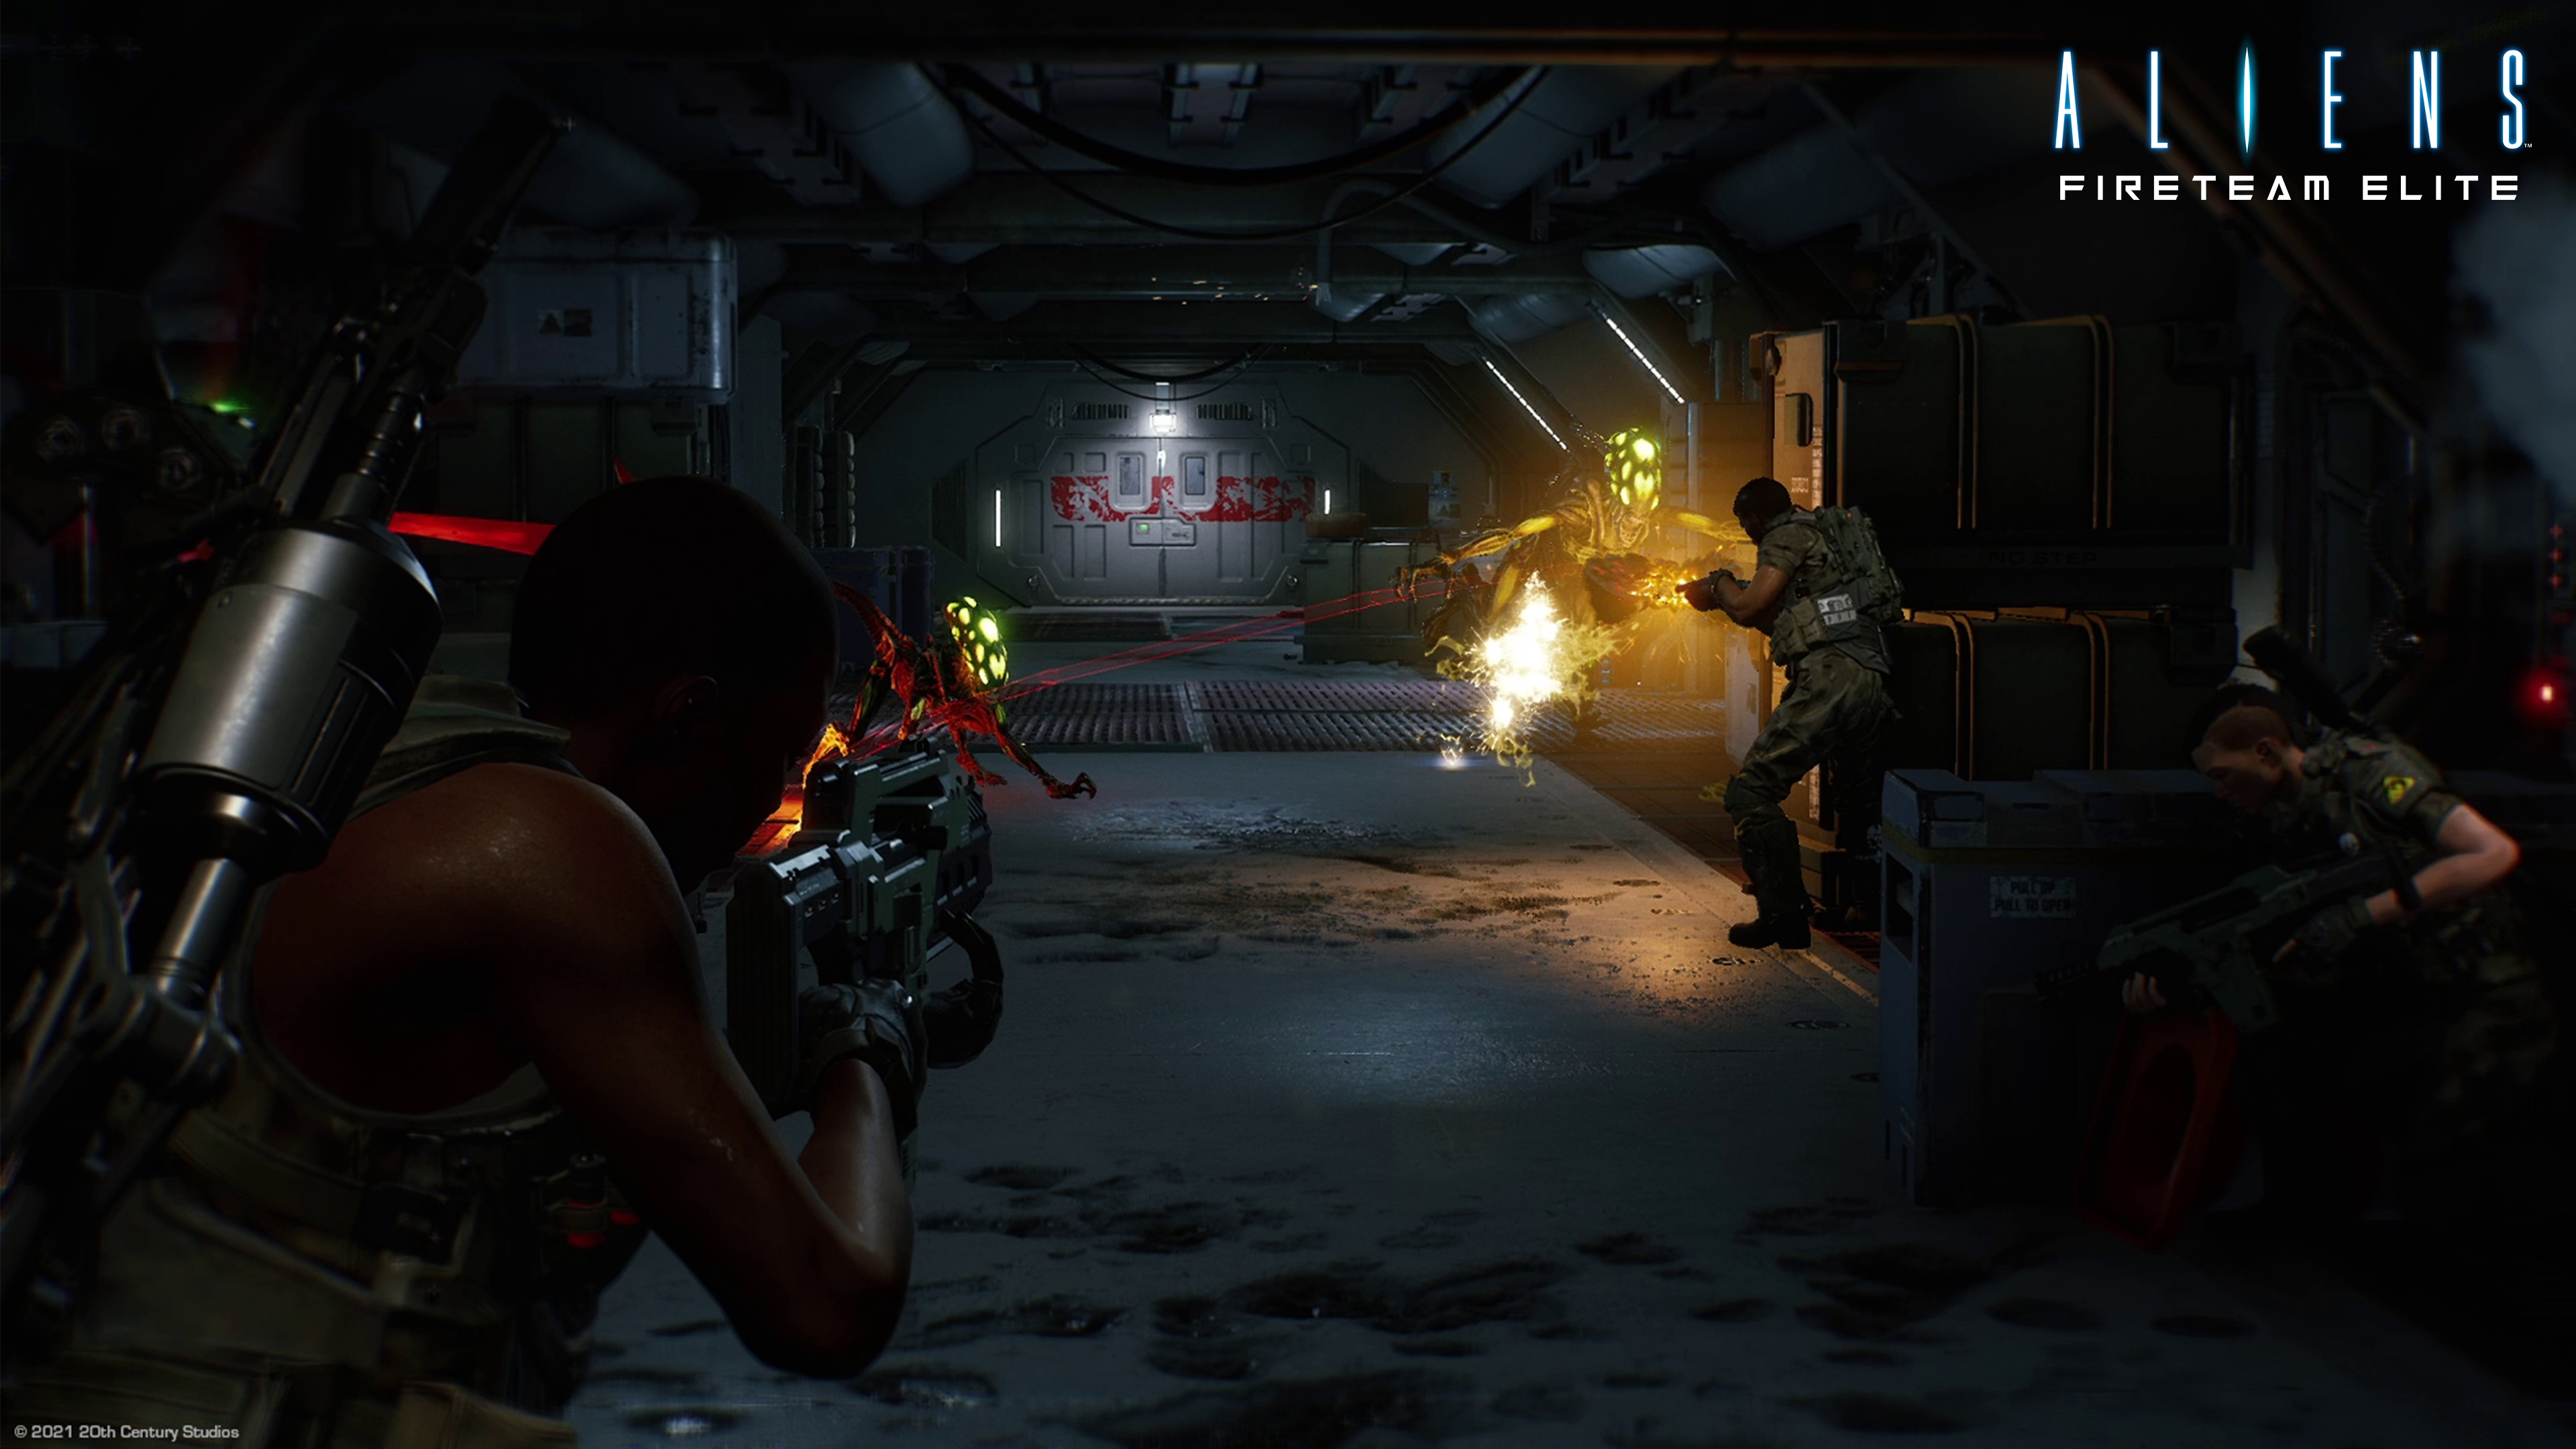 Aliens: Fireteam Elite - Deluxe Edition | EMEA (82b1416a-0c70-4a7b-9d73-99aa533c9550)